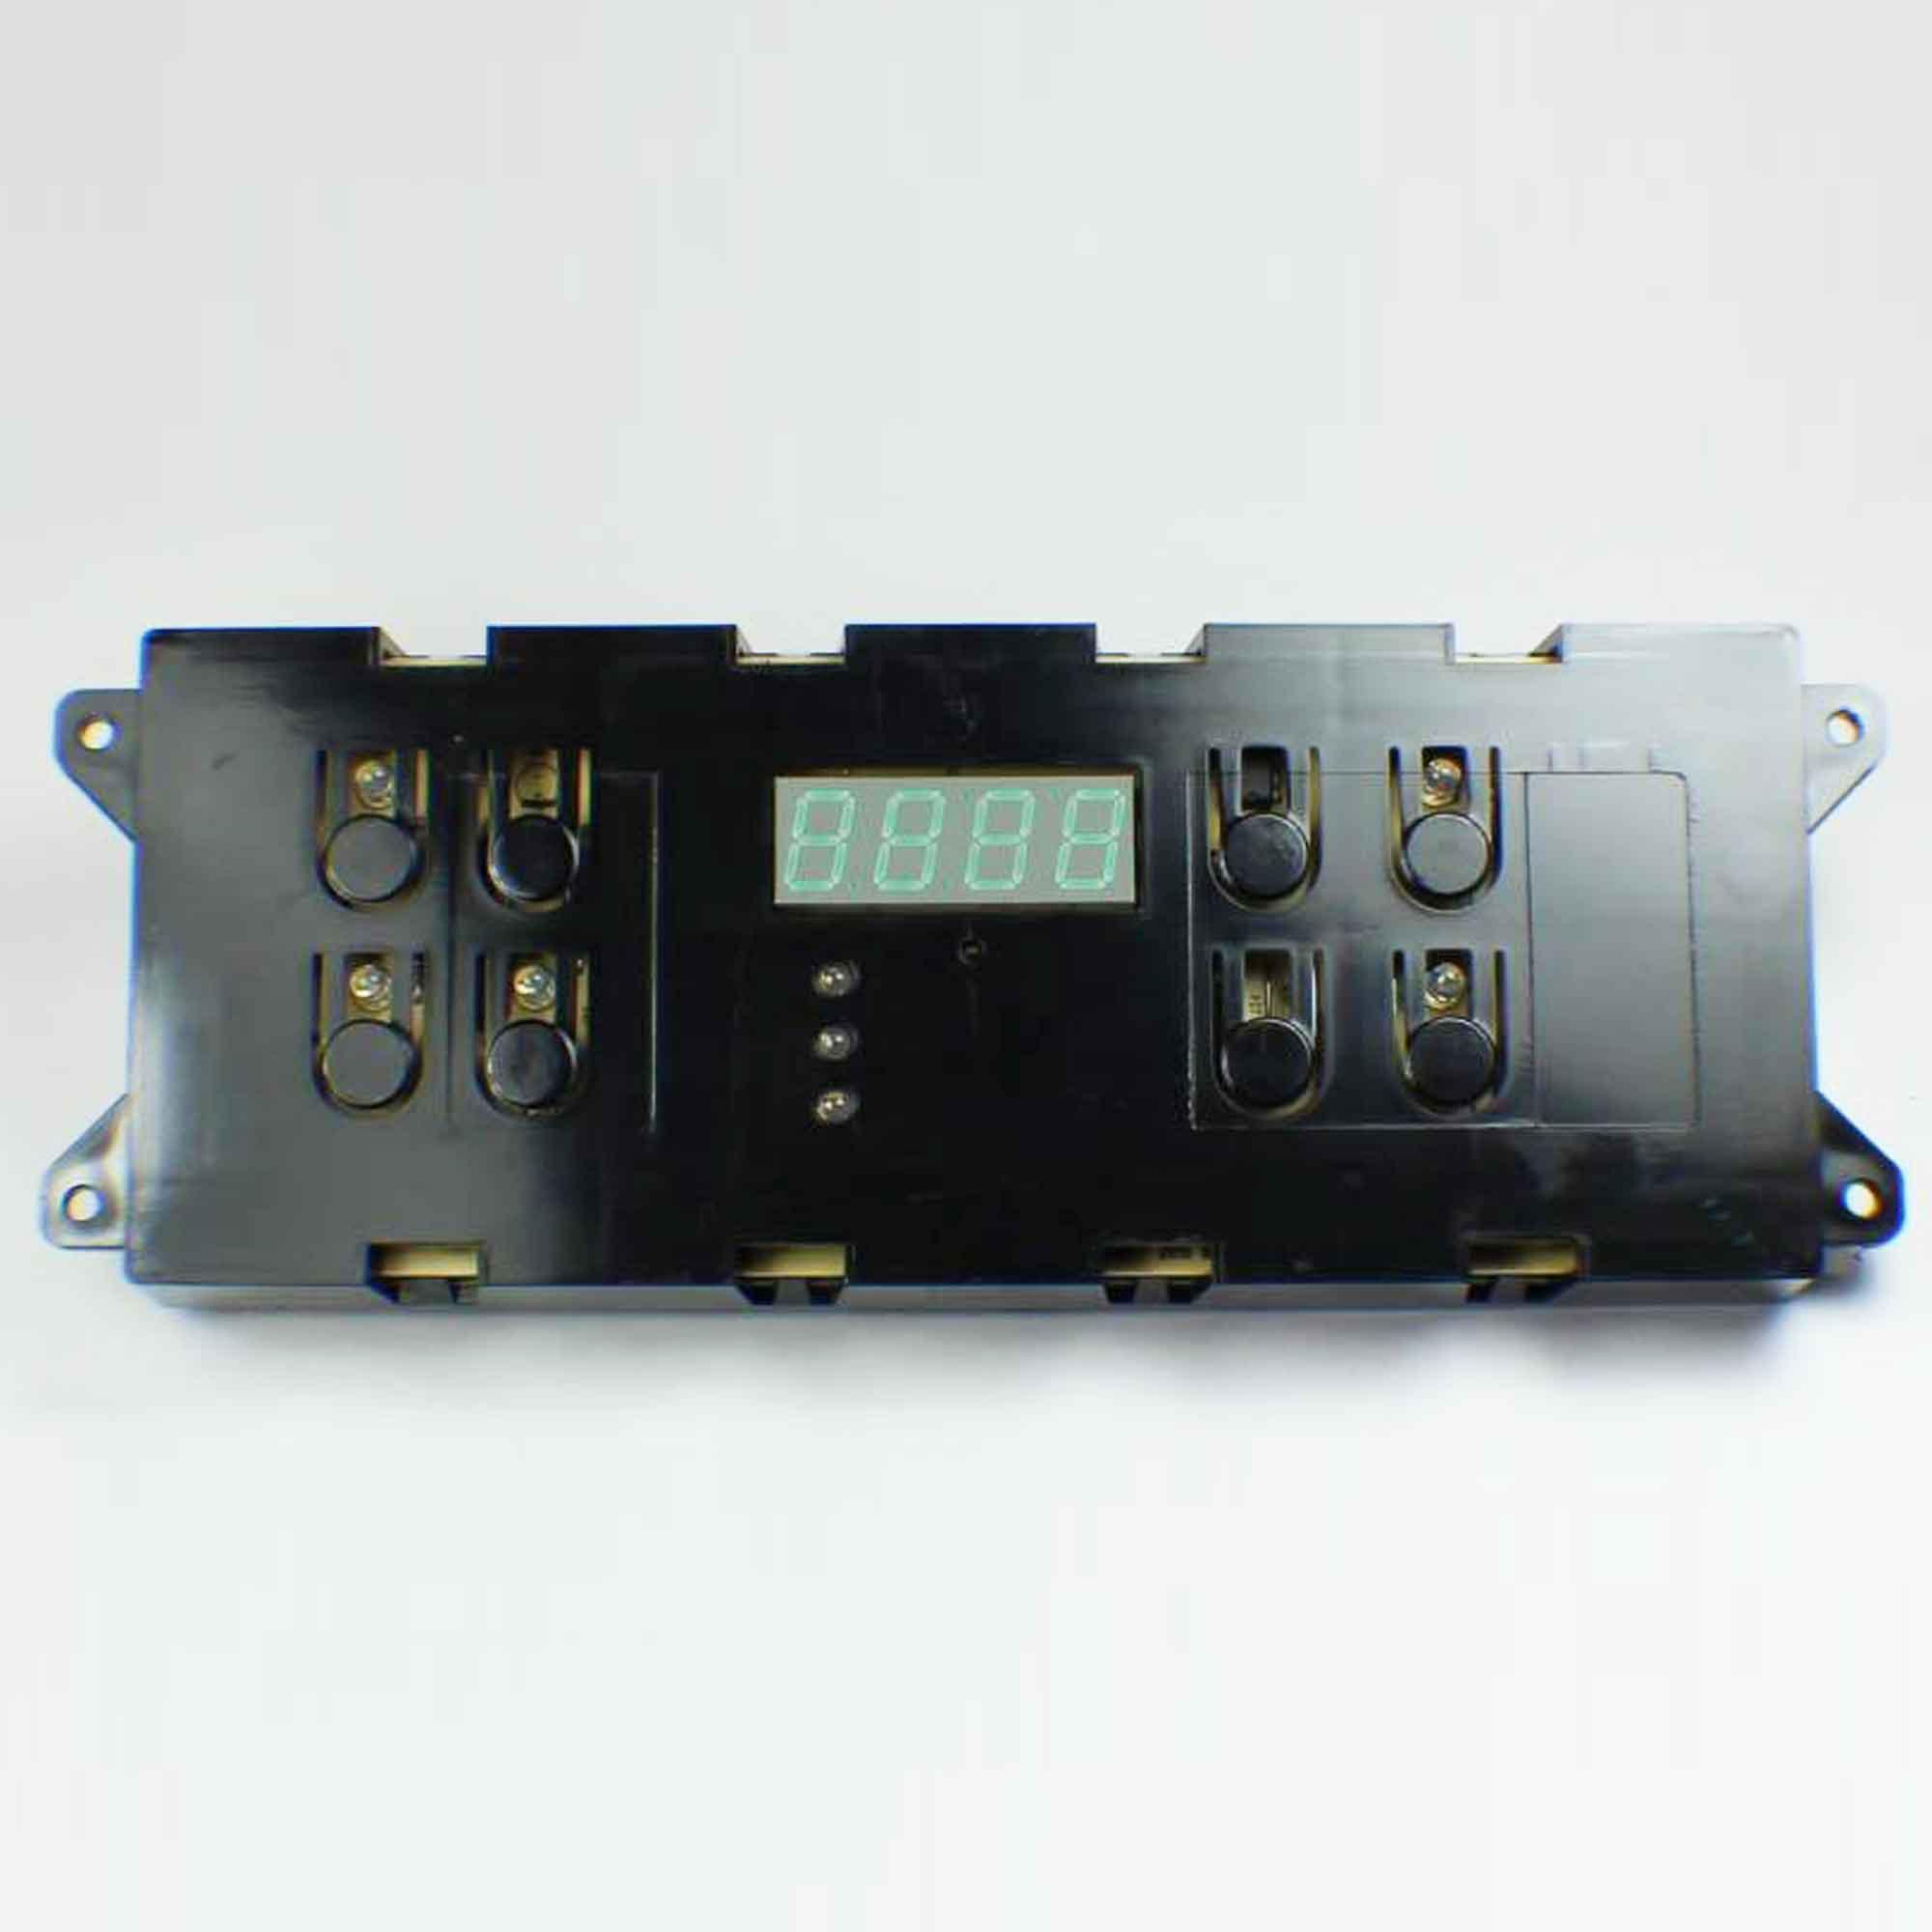 316207510 For Frigidaire Range Oven Control Board